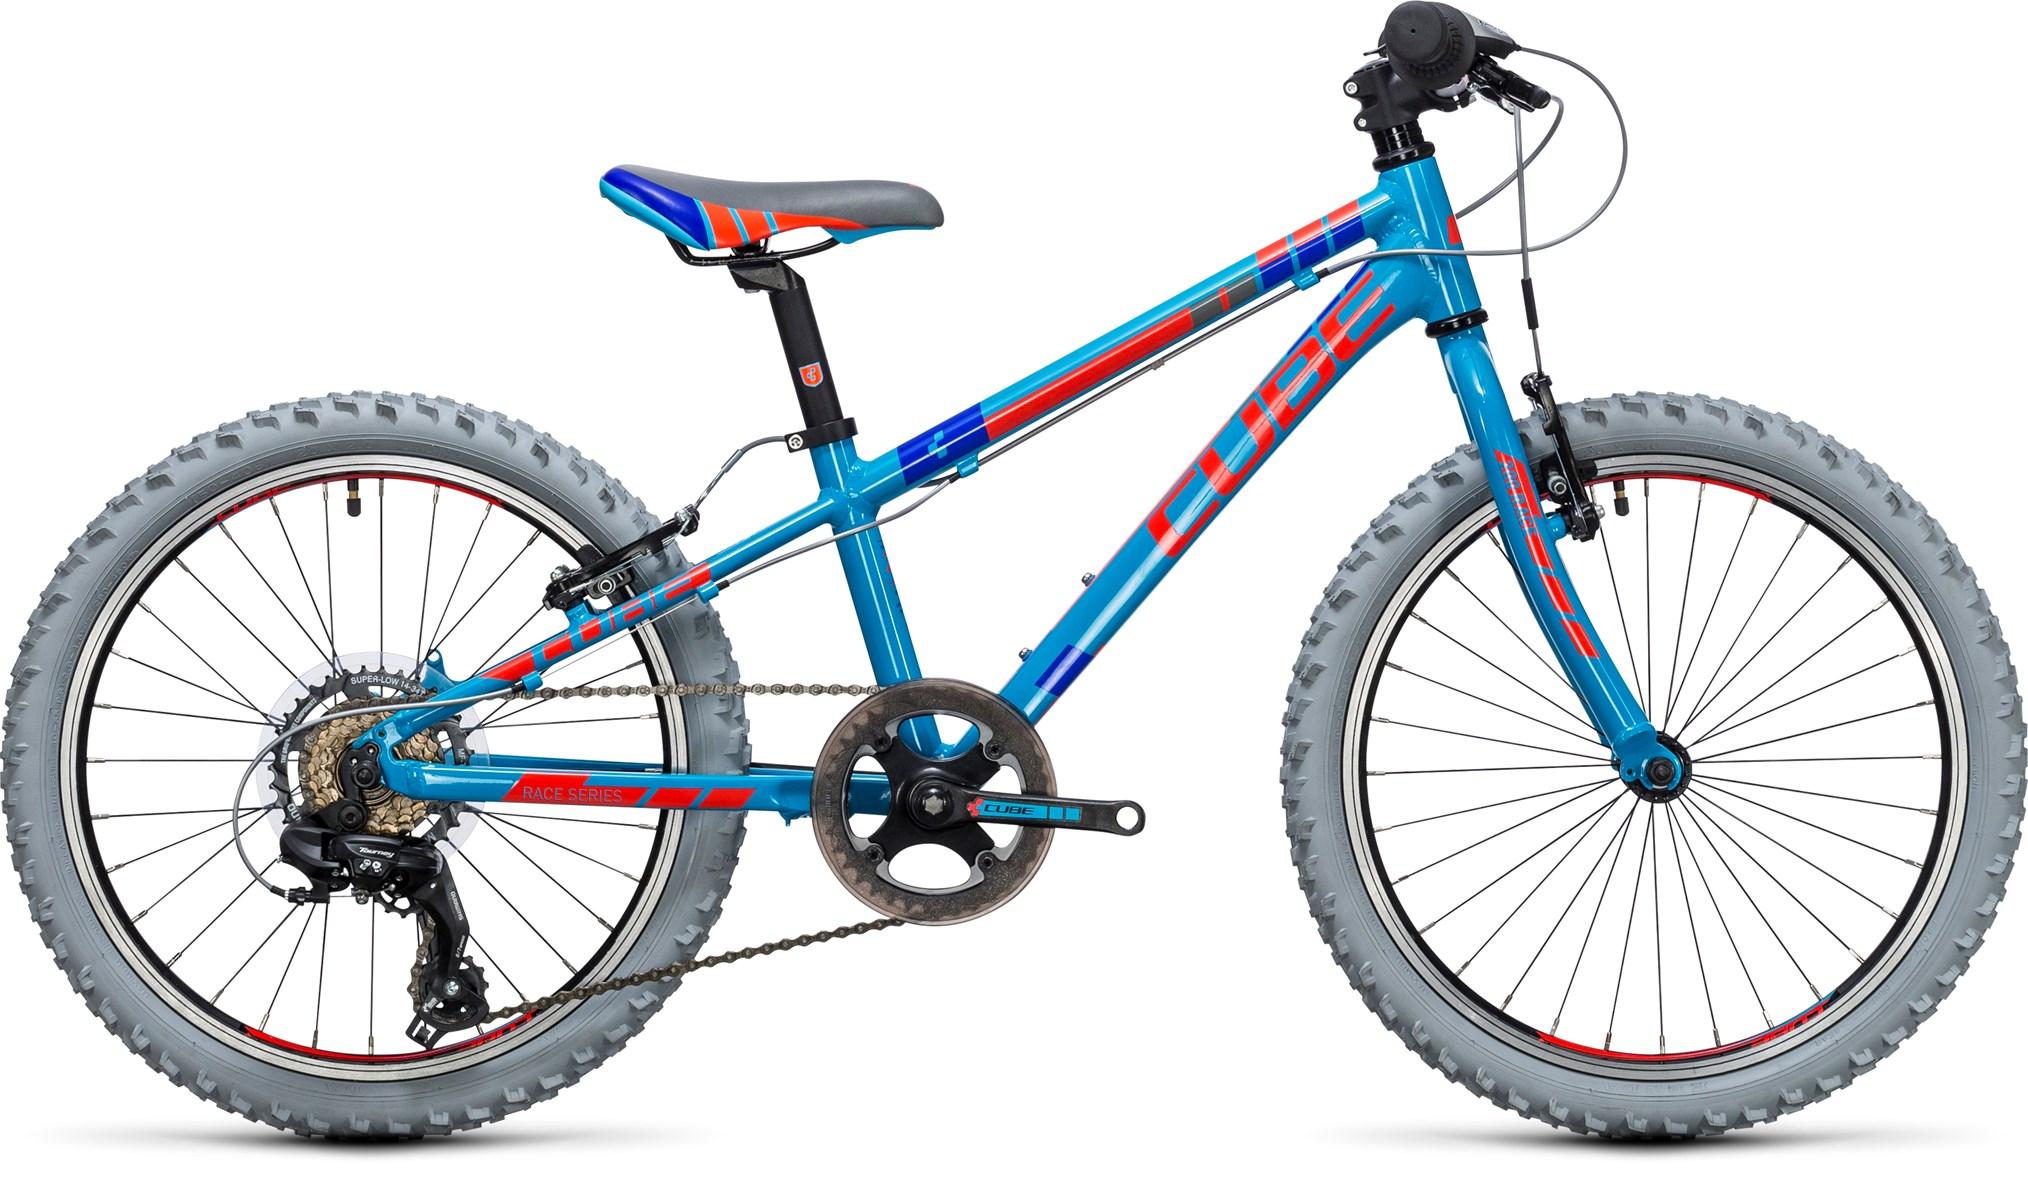 2dadd125678 2017 CUBE KID 200 BLUE RED £237.15